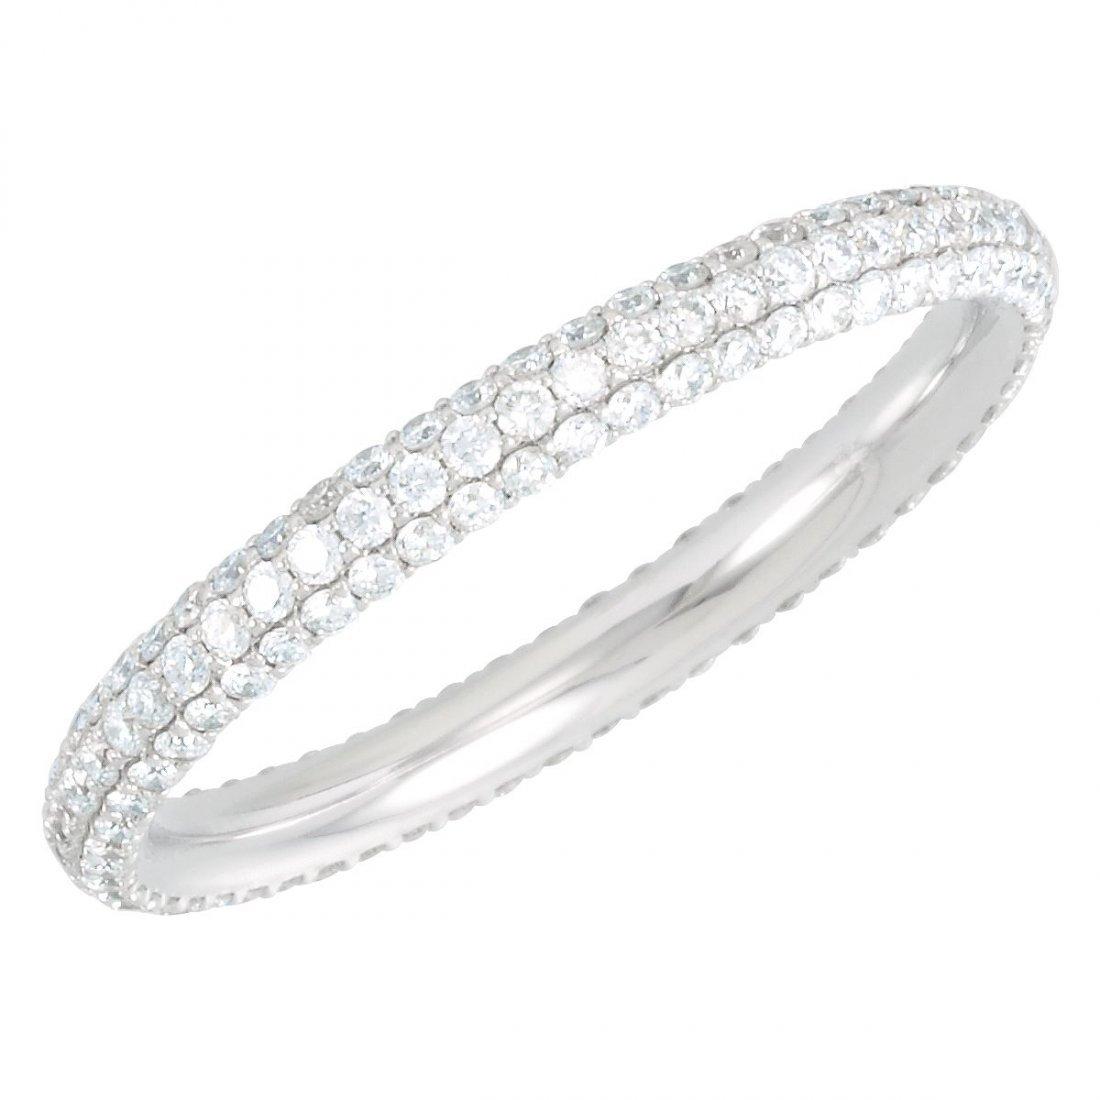 Ring - 7/8 CTW Diamond Eternity Band Size 6.5